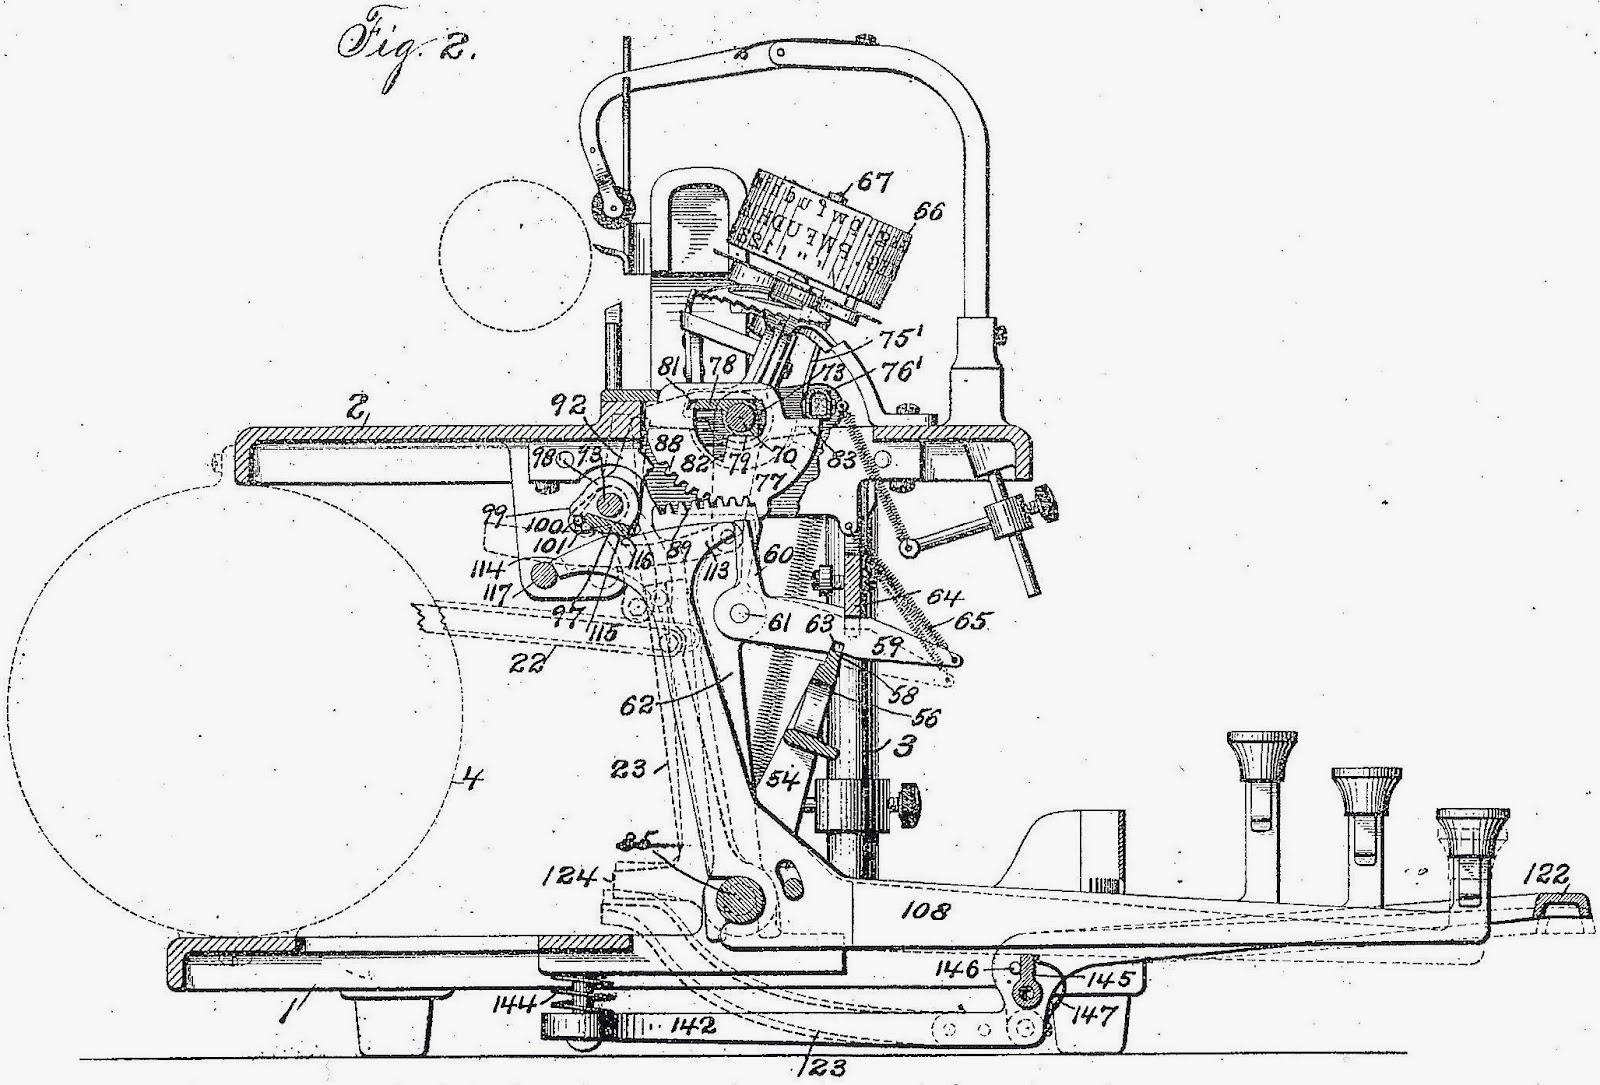 Oz Typewriter Typewriter Update February